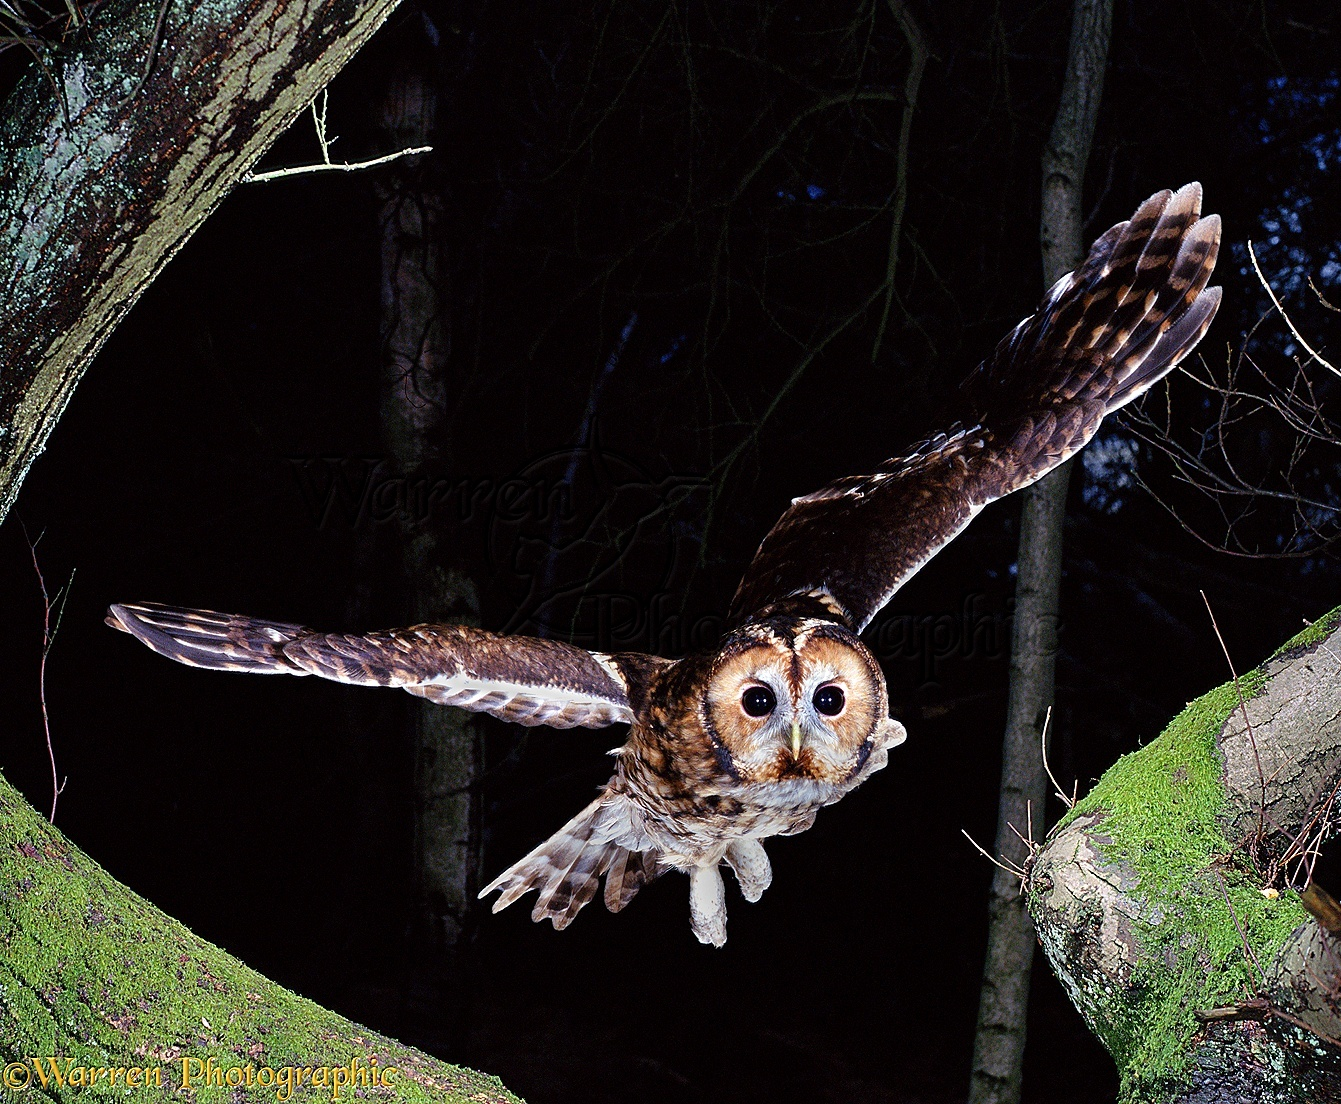 Tawny Owl flying from Chestnut tree photo WP00421